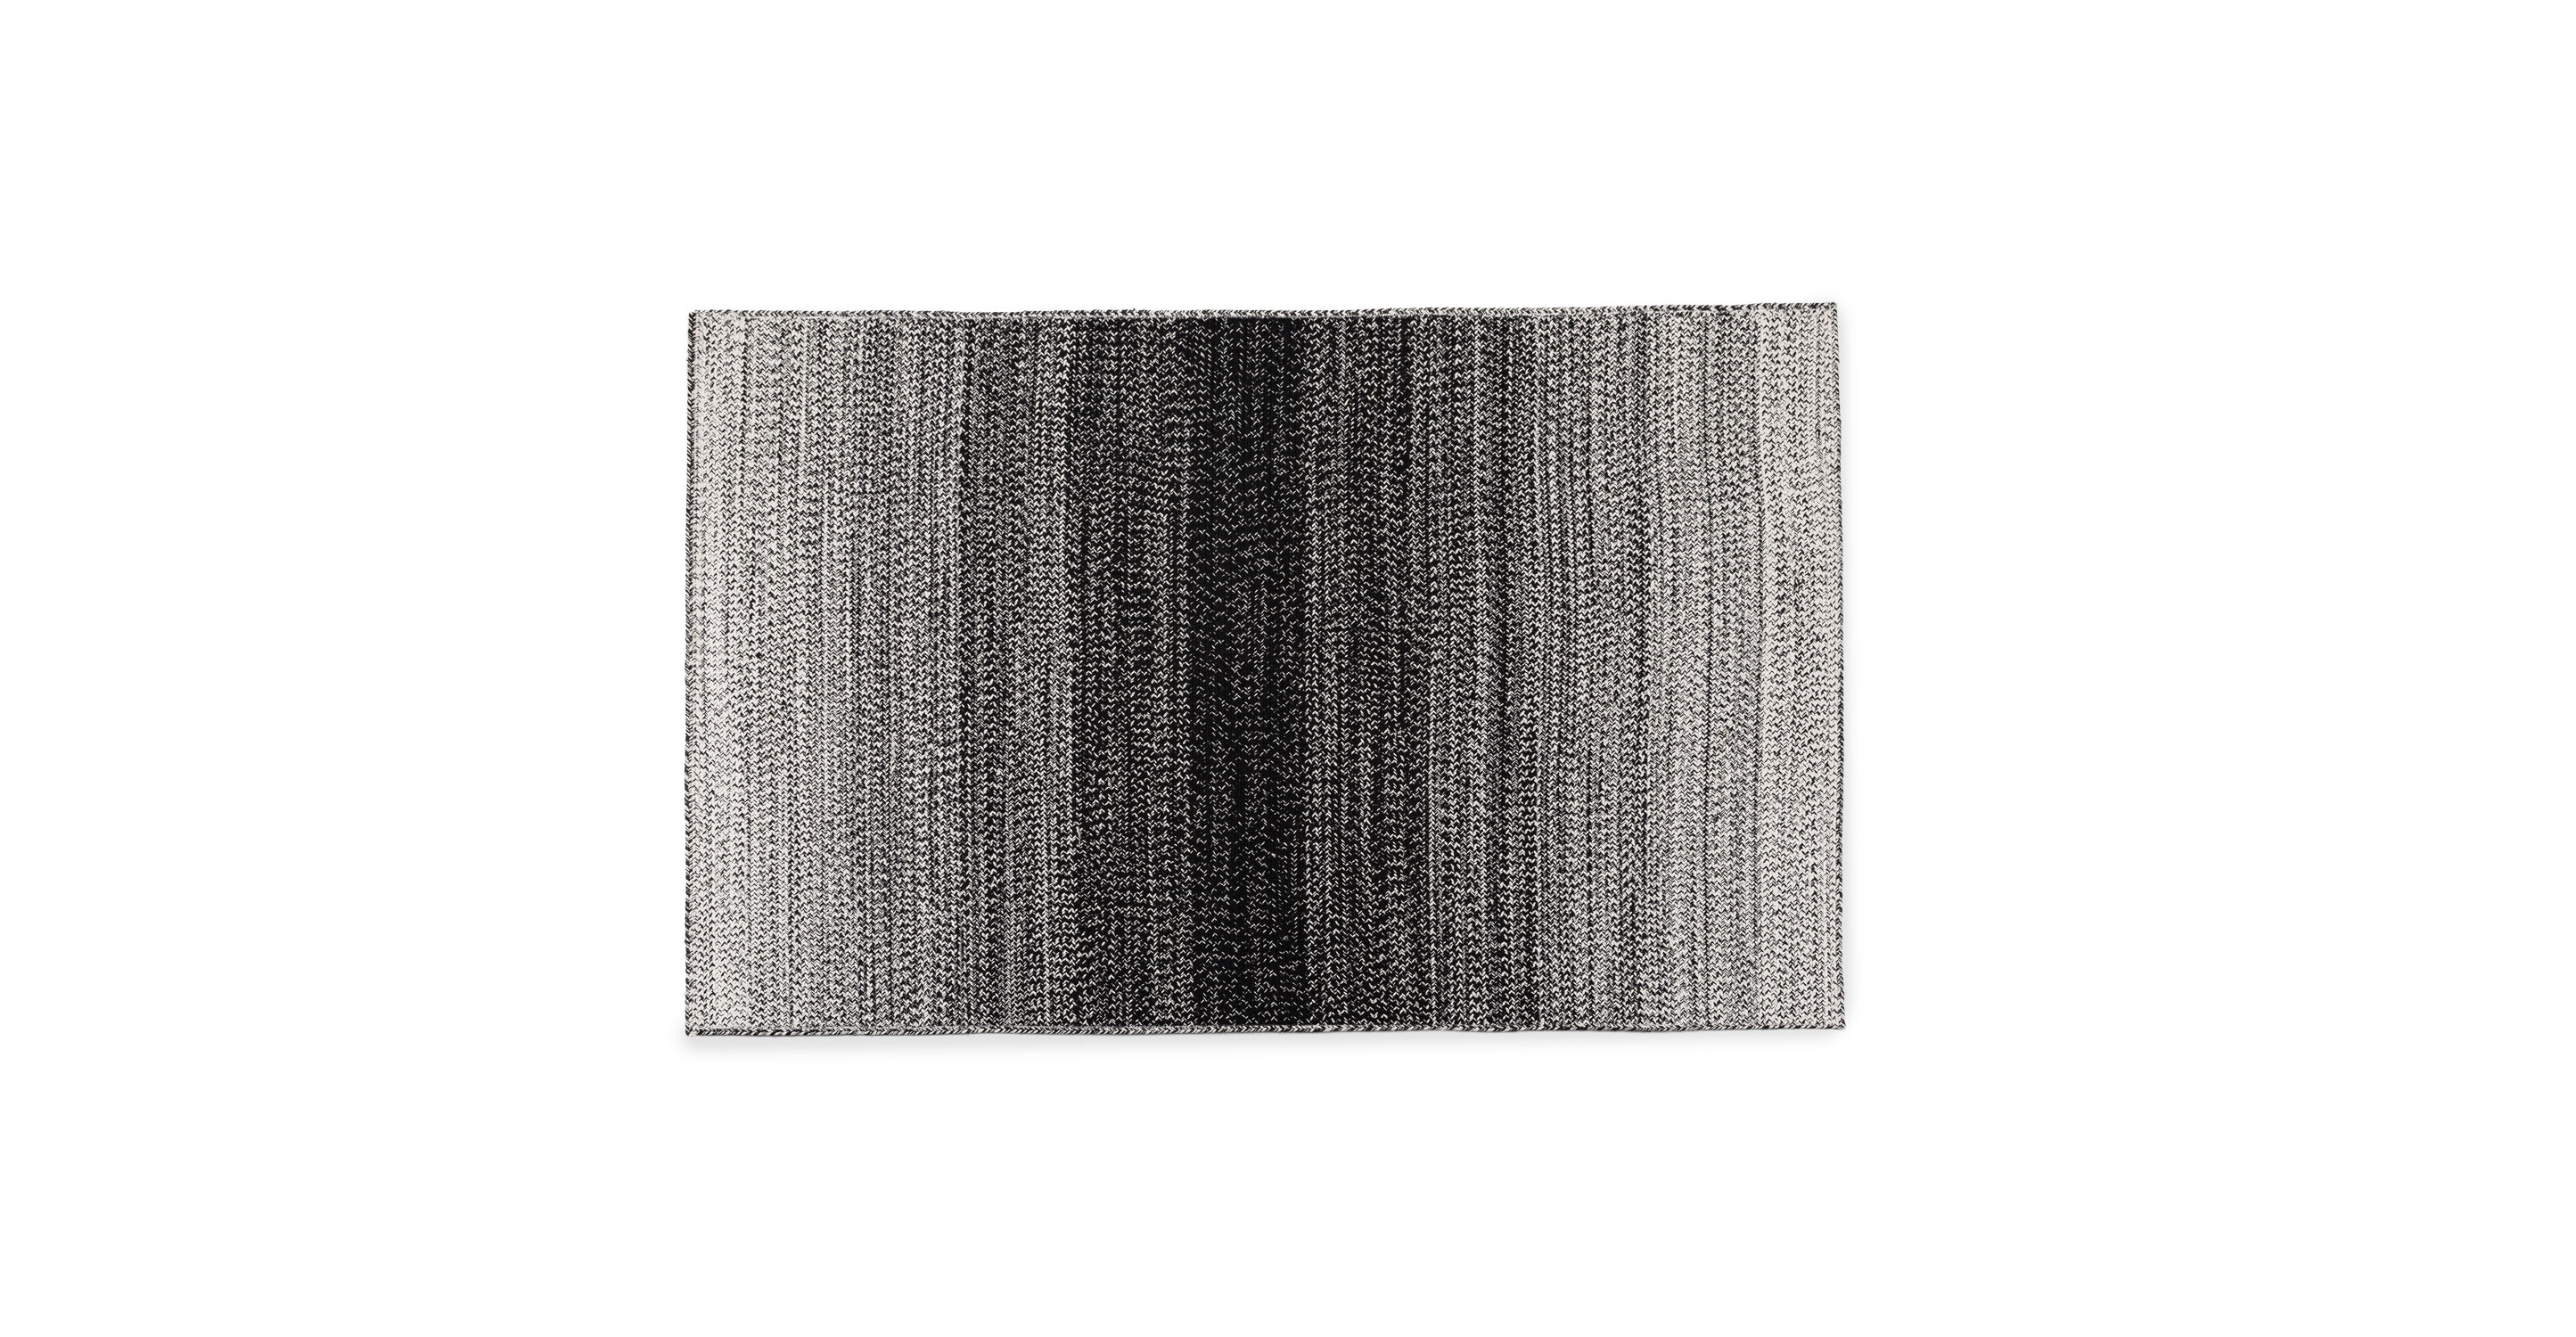 Stria Outdoor Black White Rug 5 X 8 5 X 8 Rugs